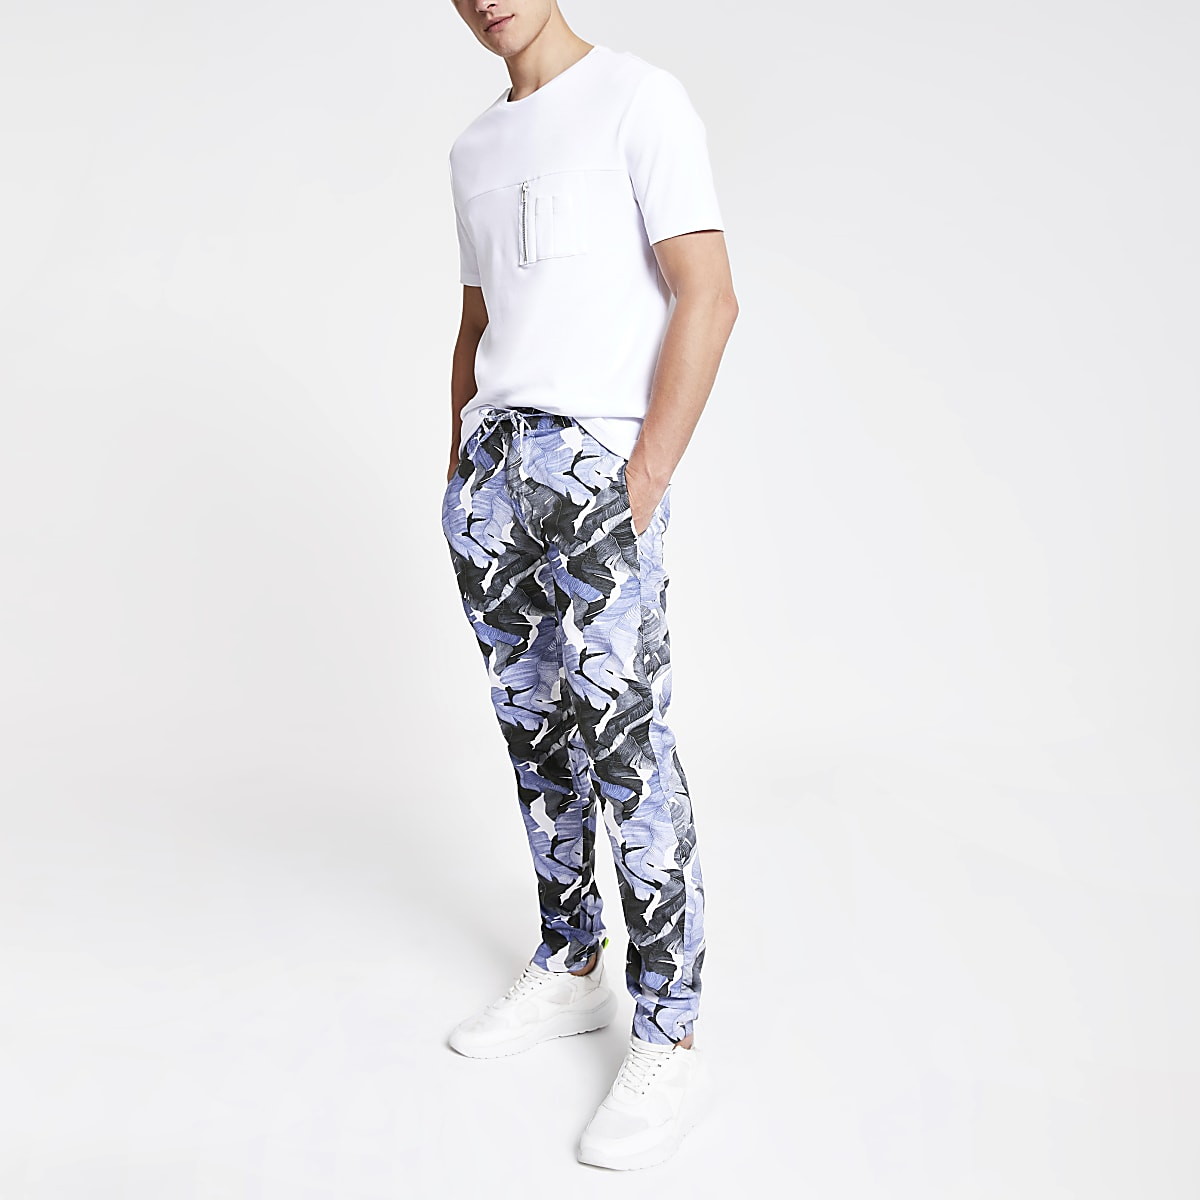 Minimum blue printed pants